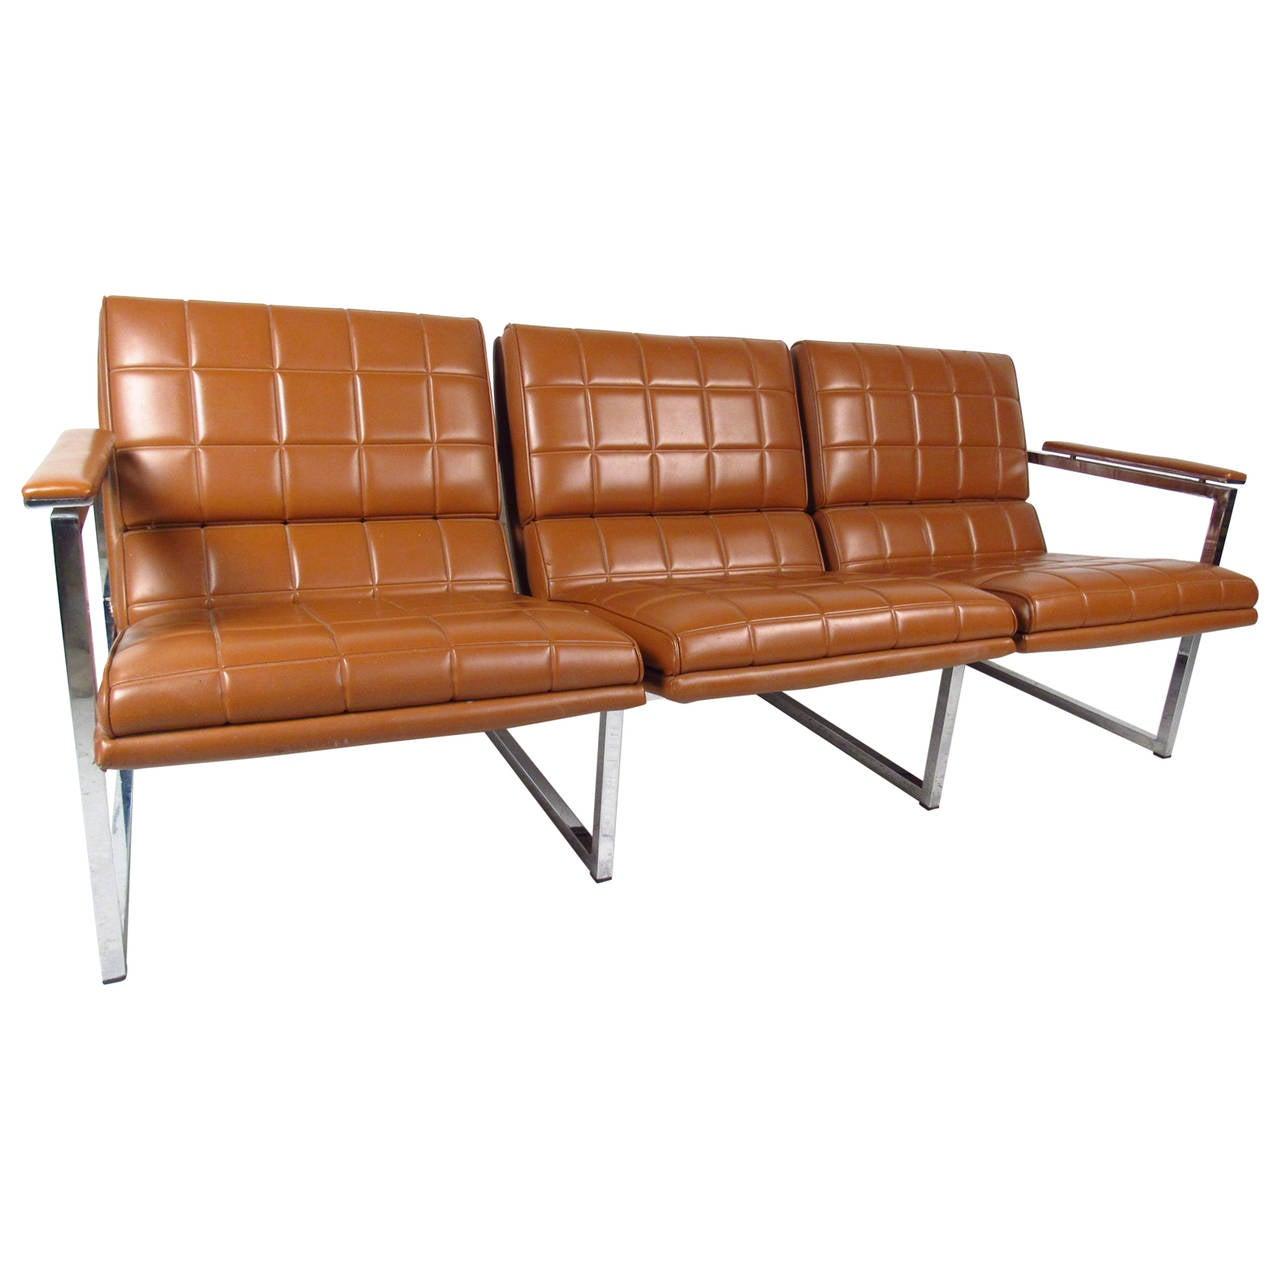 Midcentury Milo Baughman Style Three-Seat Sofa